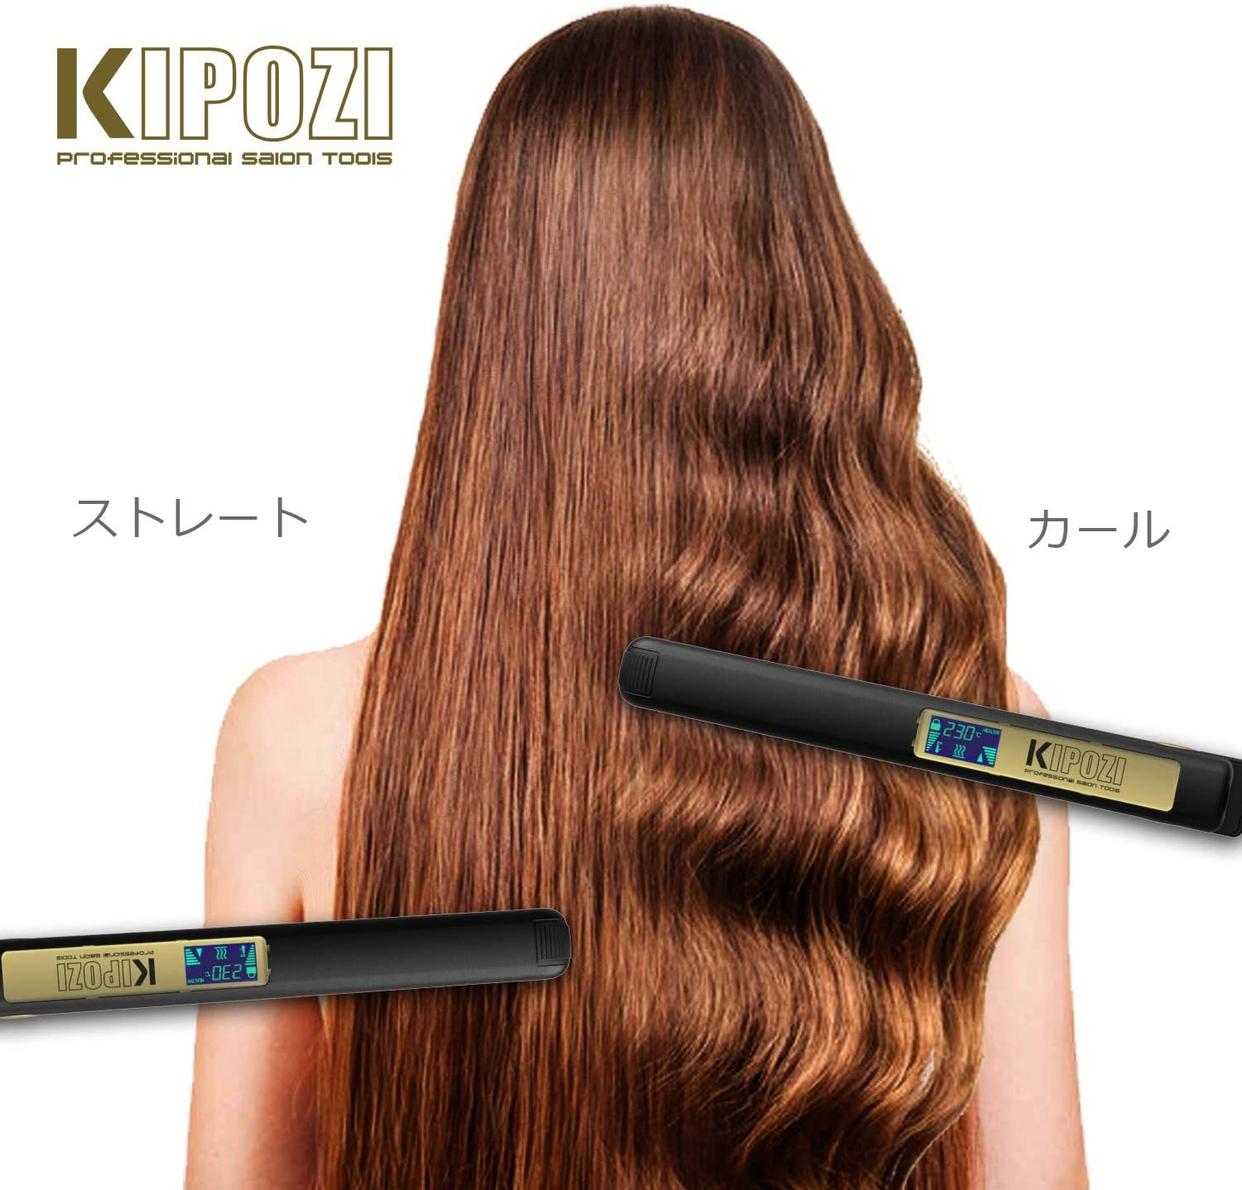 KIPOZI(キポジ) ヘアアイロン2way K-137の商品画像3